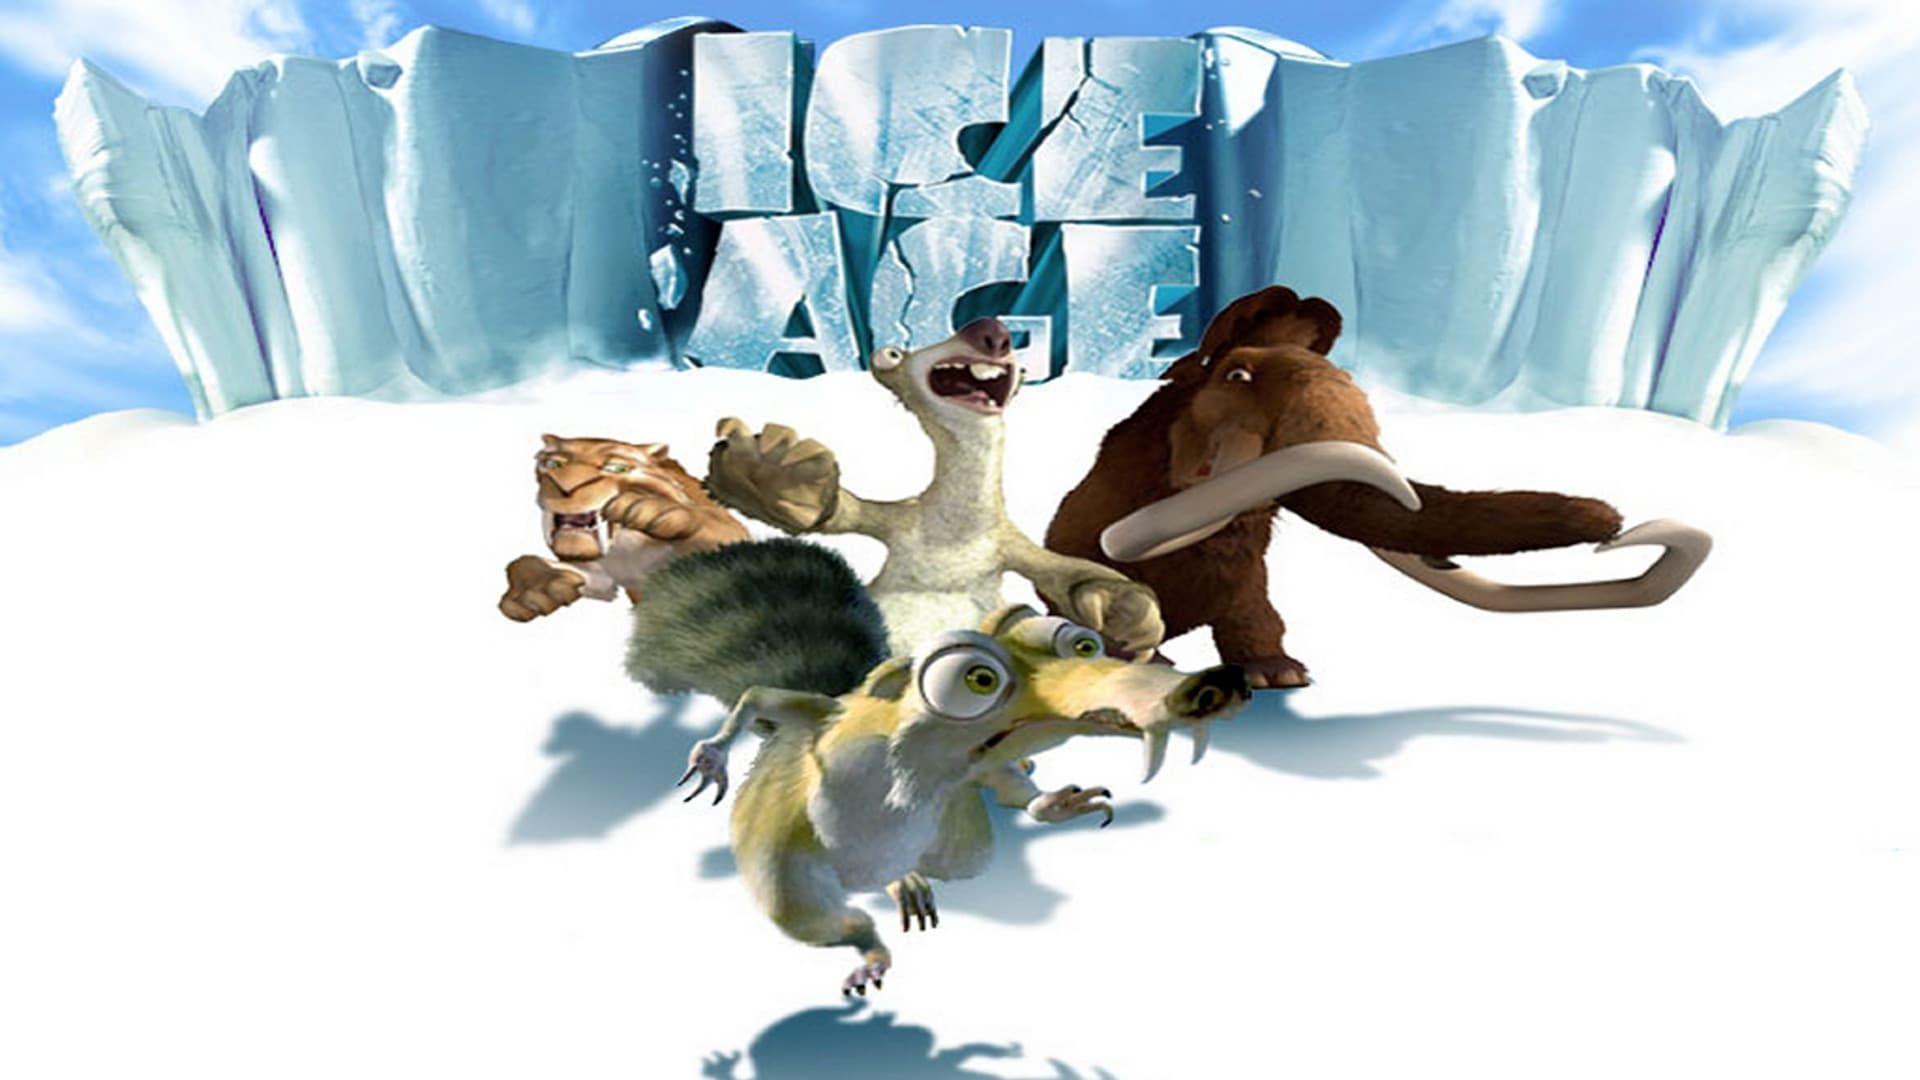 Istid 2002 Putlocker Film Complet Streaming For 20 000 Ar Siden Ved Istidens Begynnelse Blir Tre Totalt Ulike Skapning Ice Age Ice Age Village Ice Age Movies